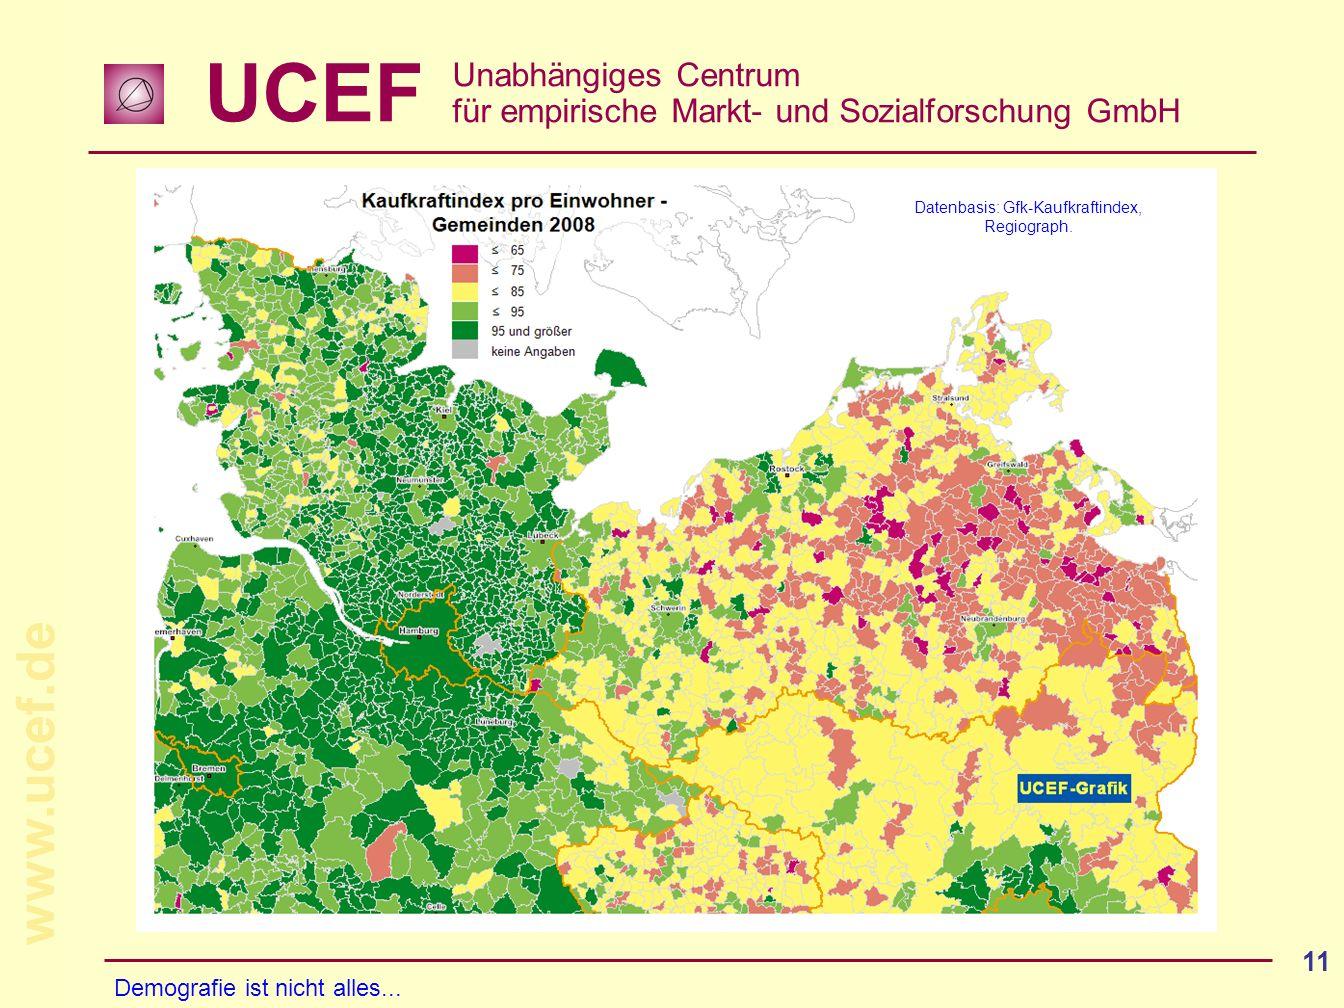 Datenbasis: Gfk-Kaufkraftindex, Regiograph.